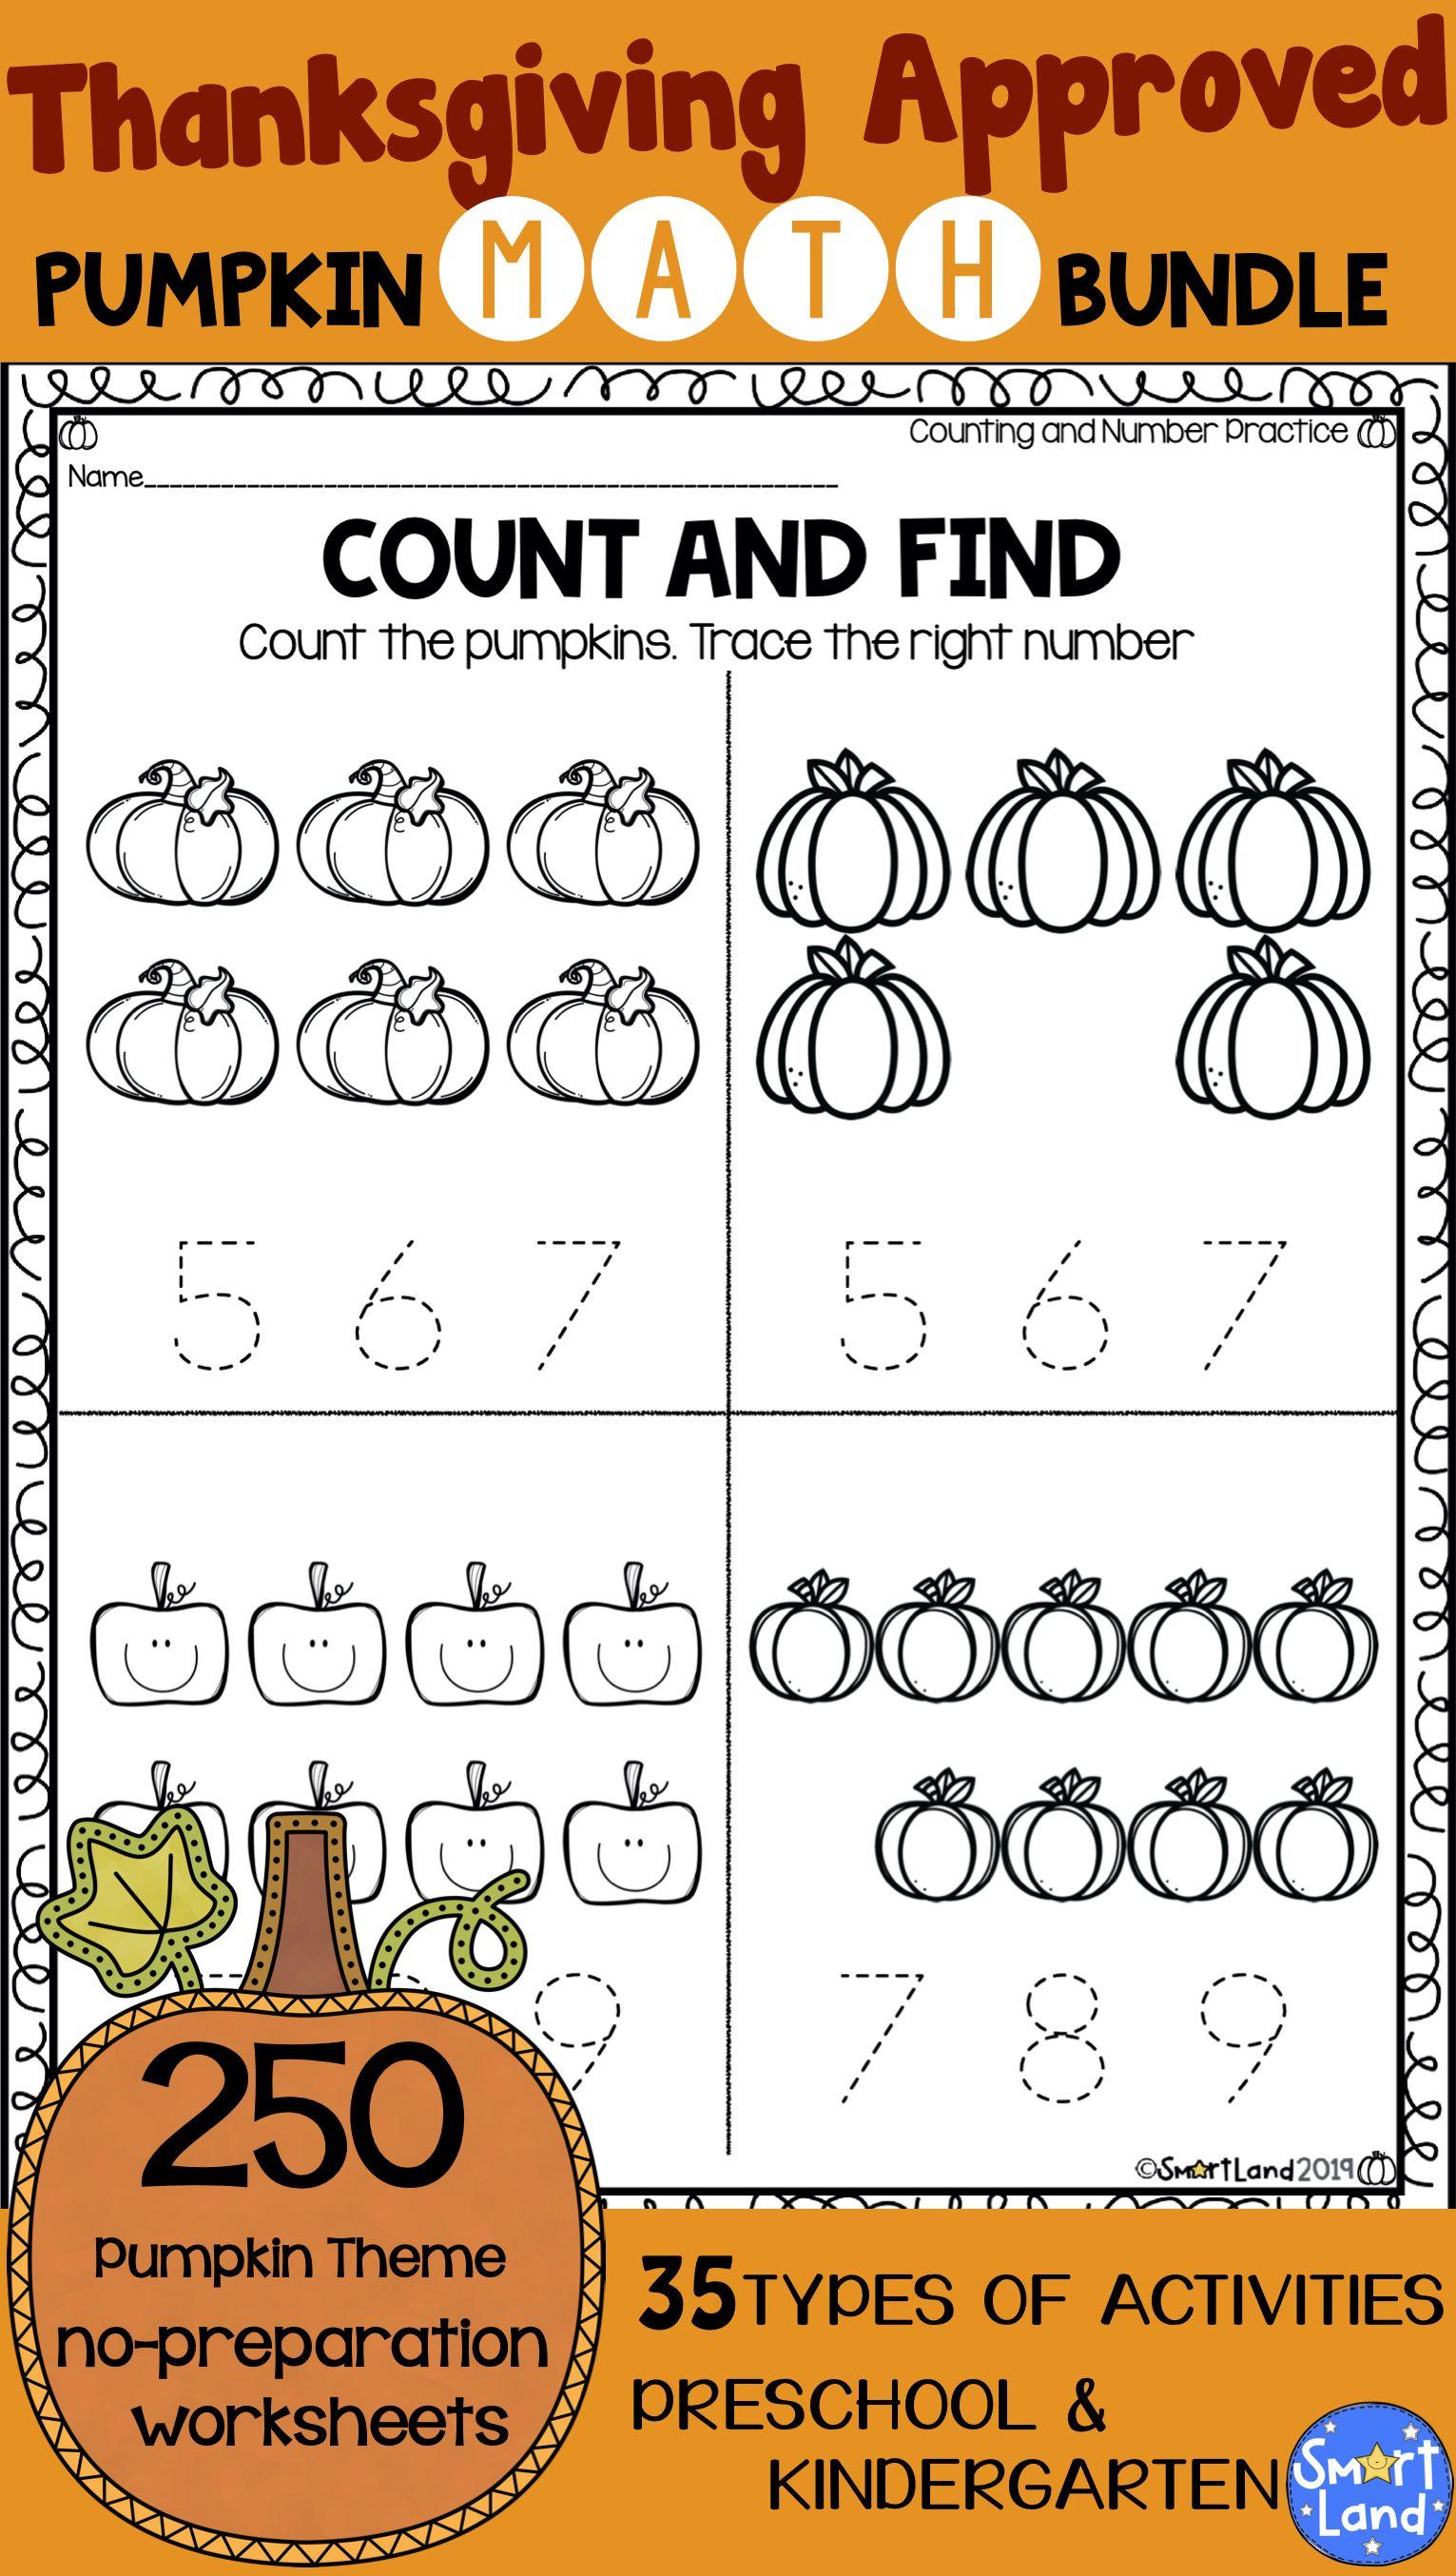 Math Worksheets Complete Number Practice Set Of Printables Numbers 1 10 Prek K 250 Pages Math Practice Worksheets Preschool Math Worksheets Math